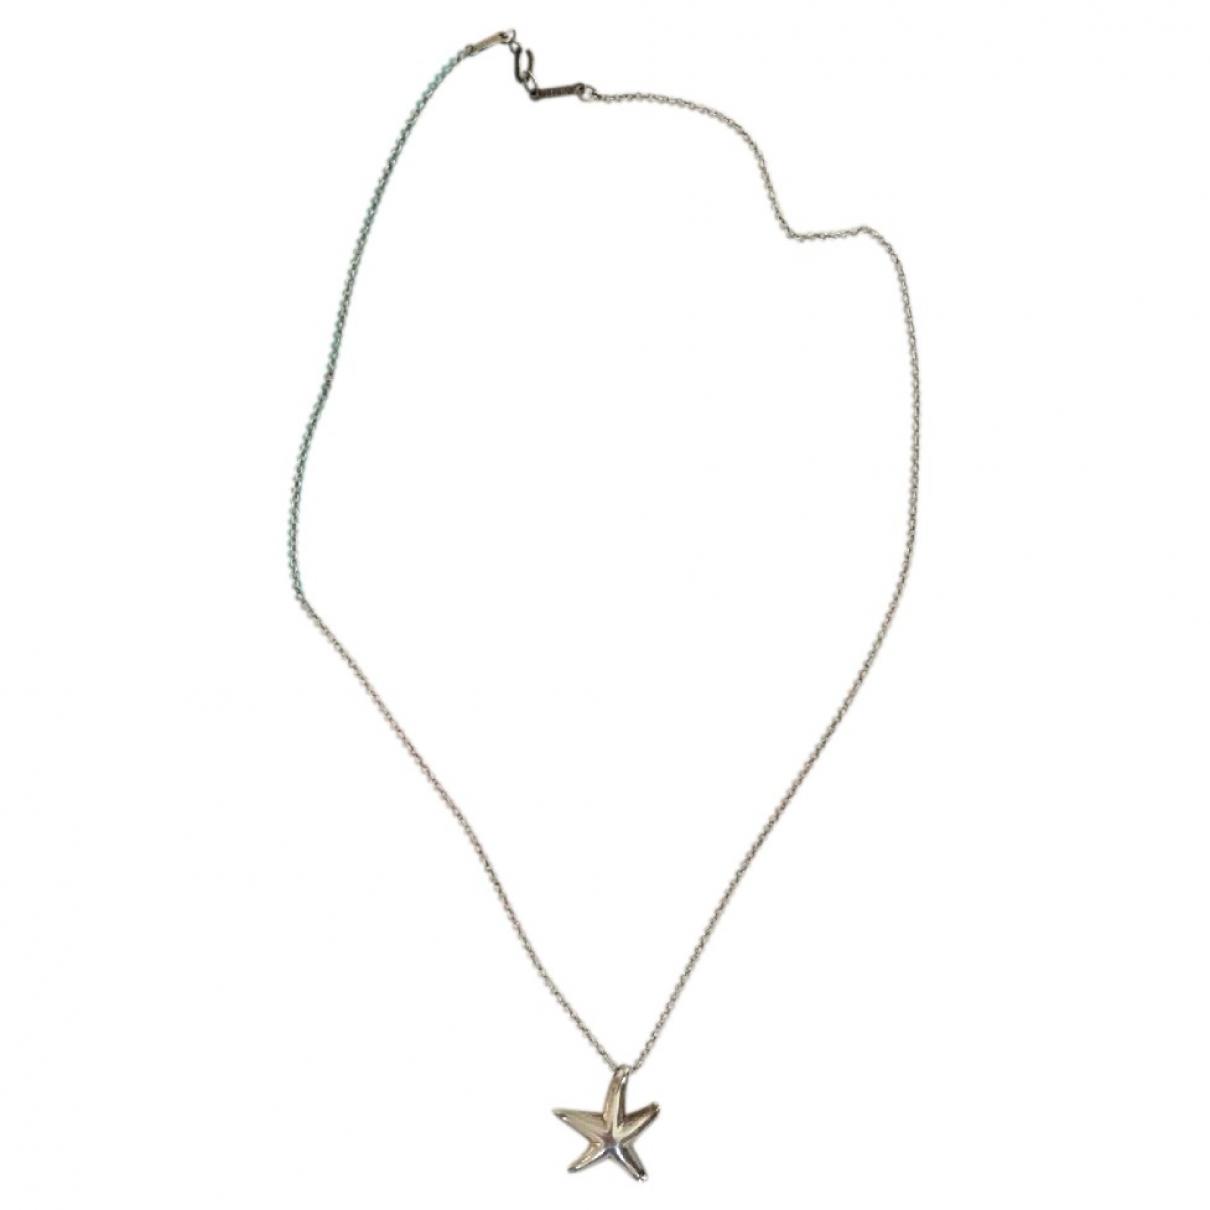 Tiffany & Co Elsa Peretti  Kette in  Silber Silber